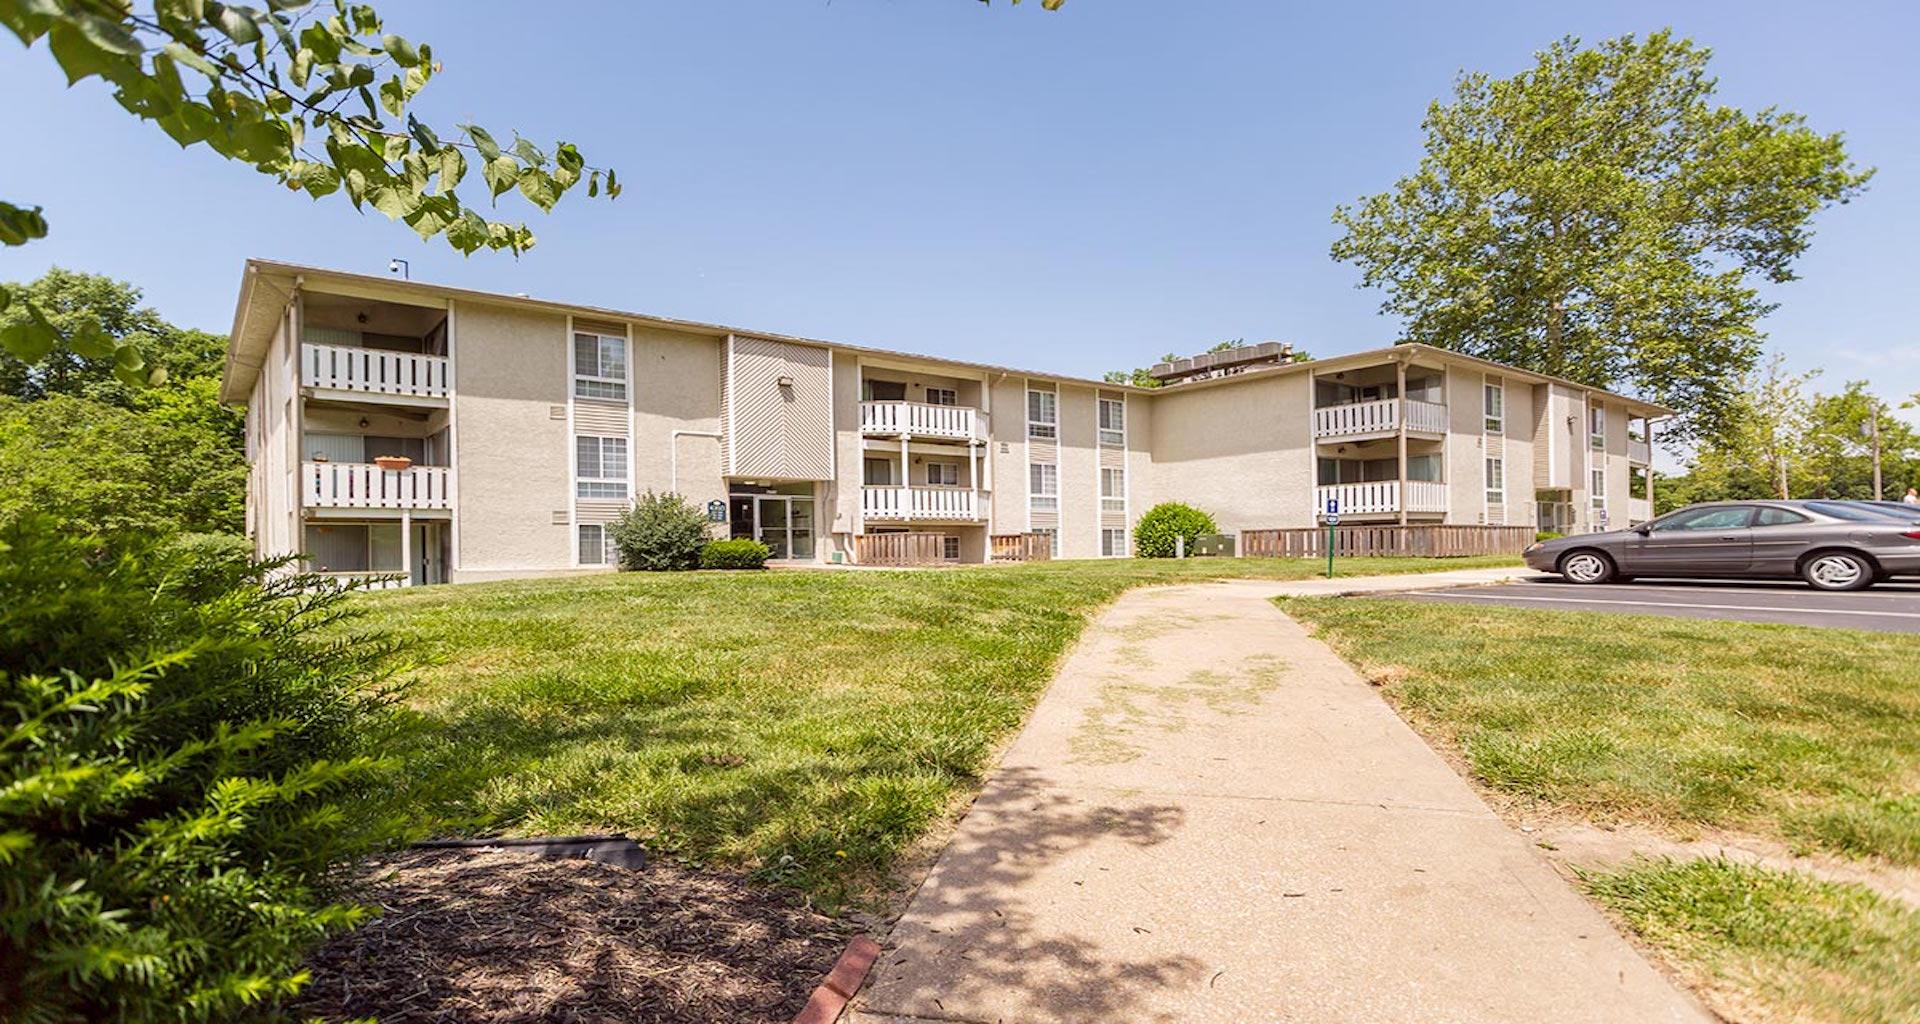 Forest Park Apartments Kansas City MO